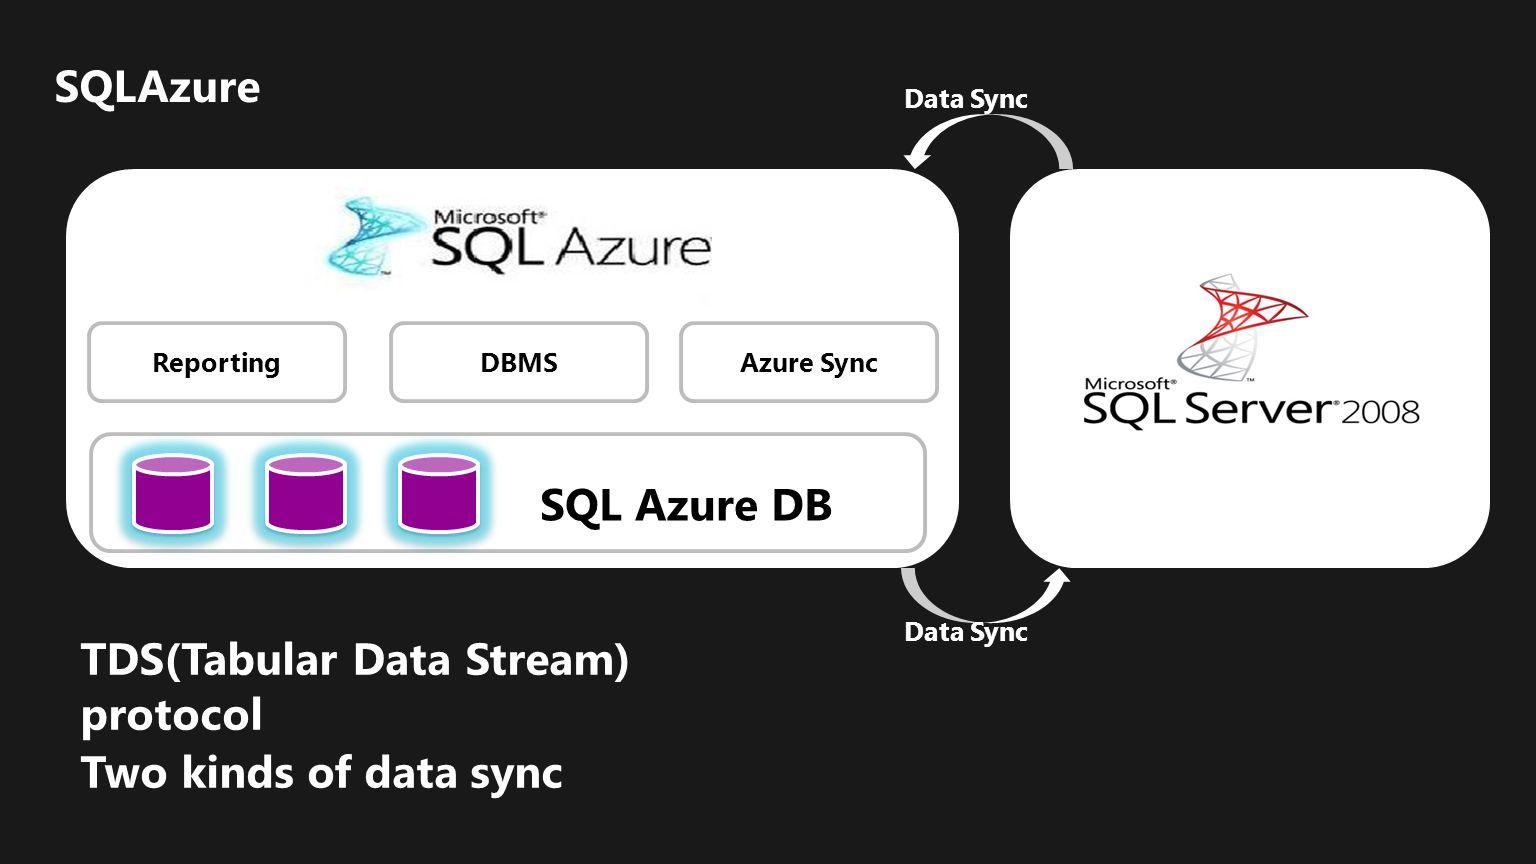 TDS(Tabular Data Stream) protocol